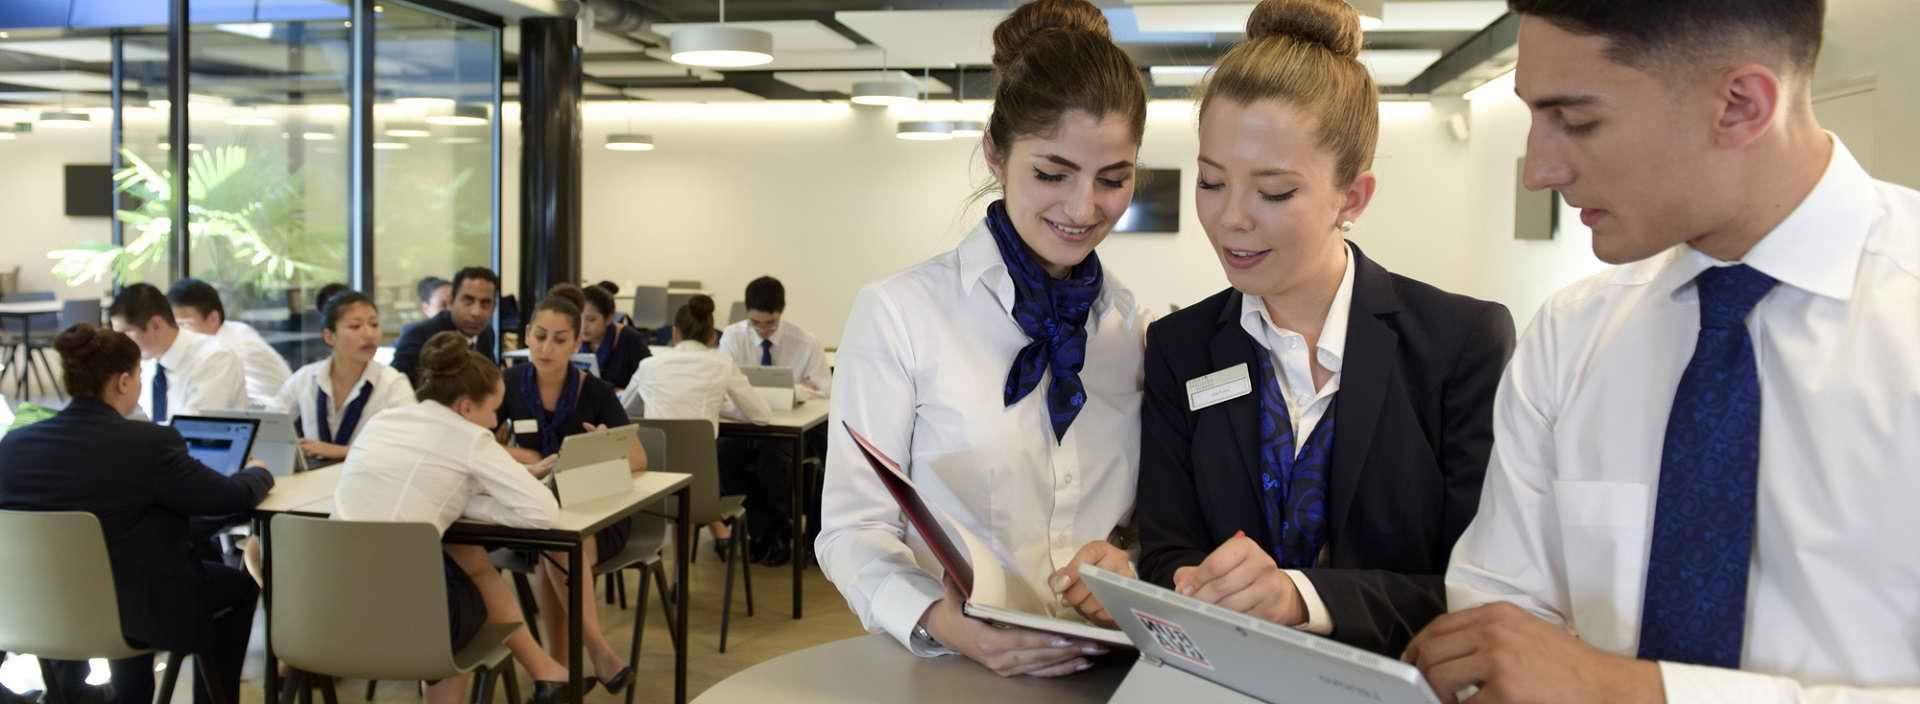 Swiss Hotel Managament School Geneva - School's rates